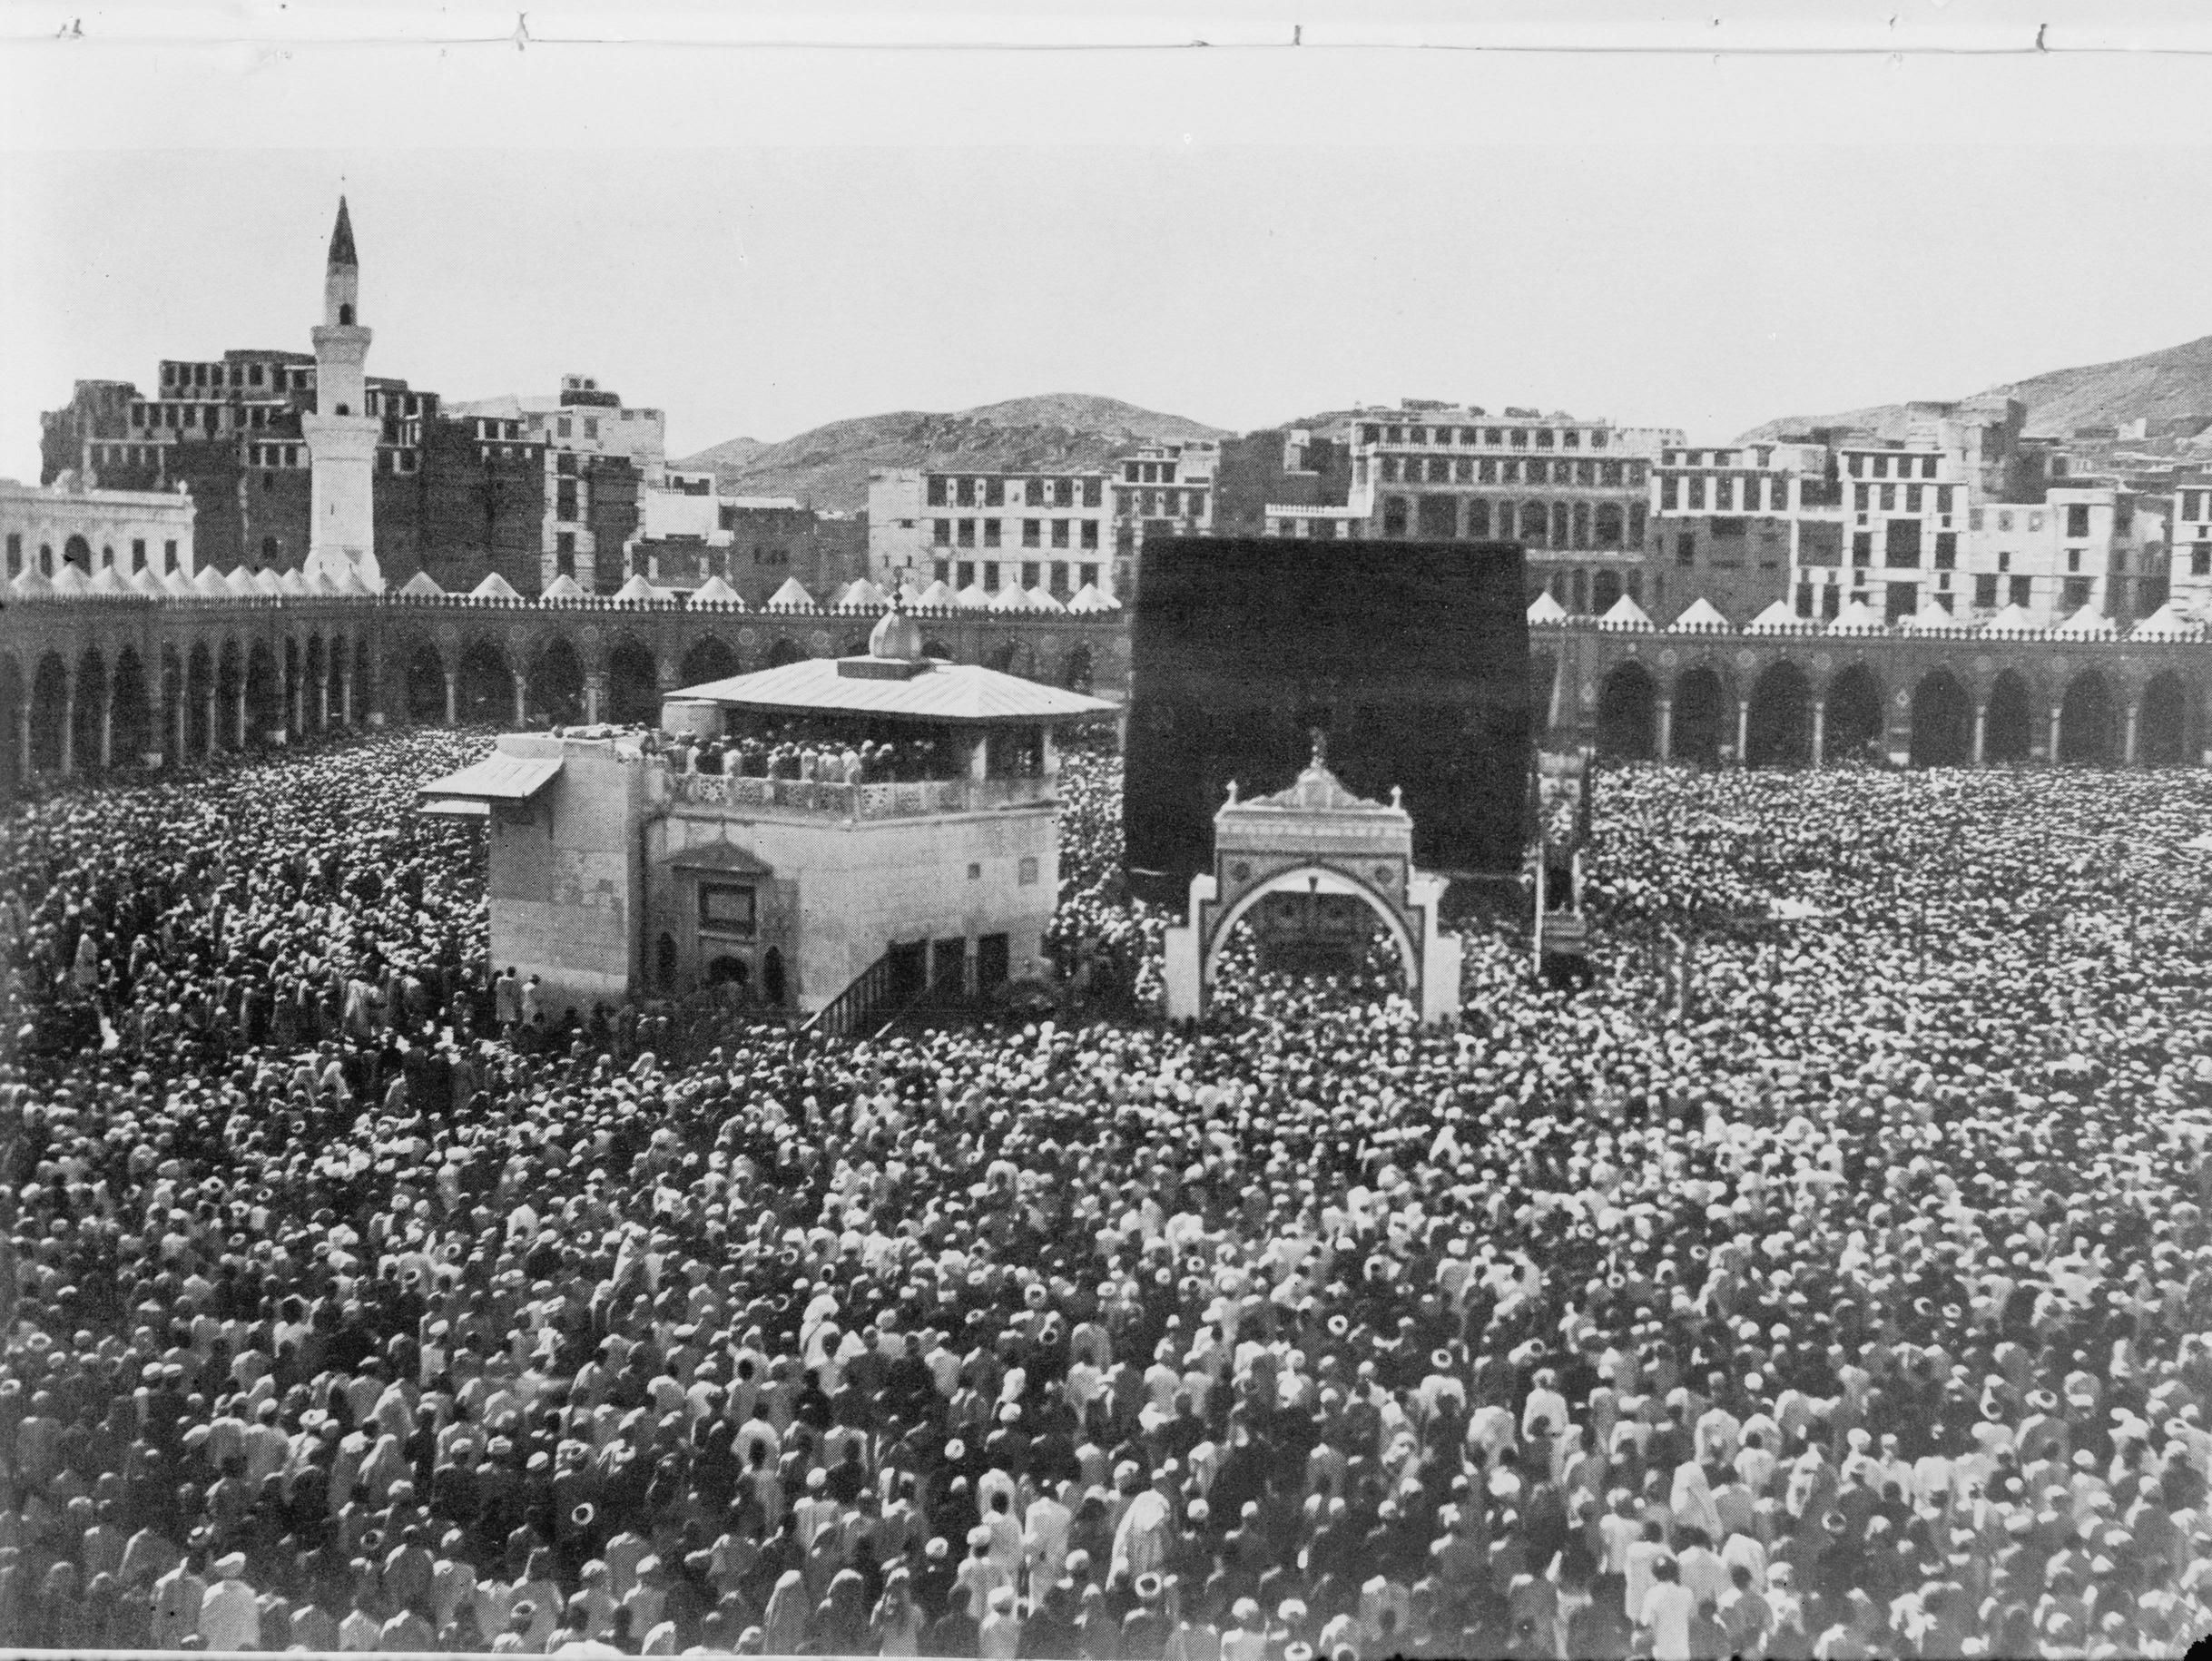 Pilgrims On Hajj Reach Their Destination The Kaaba At Al Haram Mosque Mecca Circa 1910 2437 1830 Mecca Hajj Pilgrimage Mosque